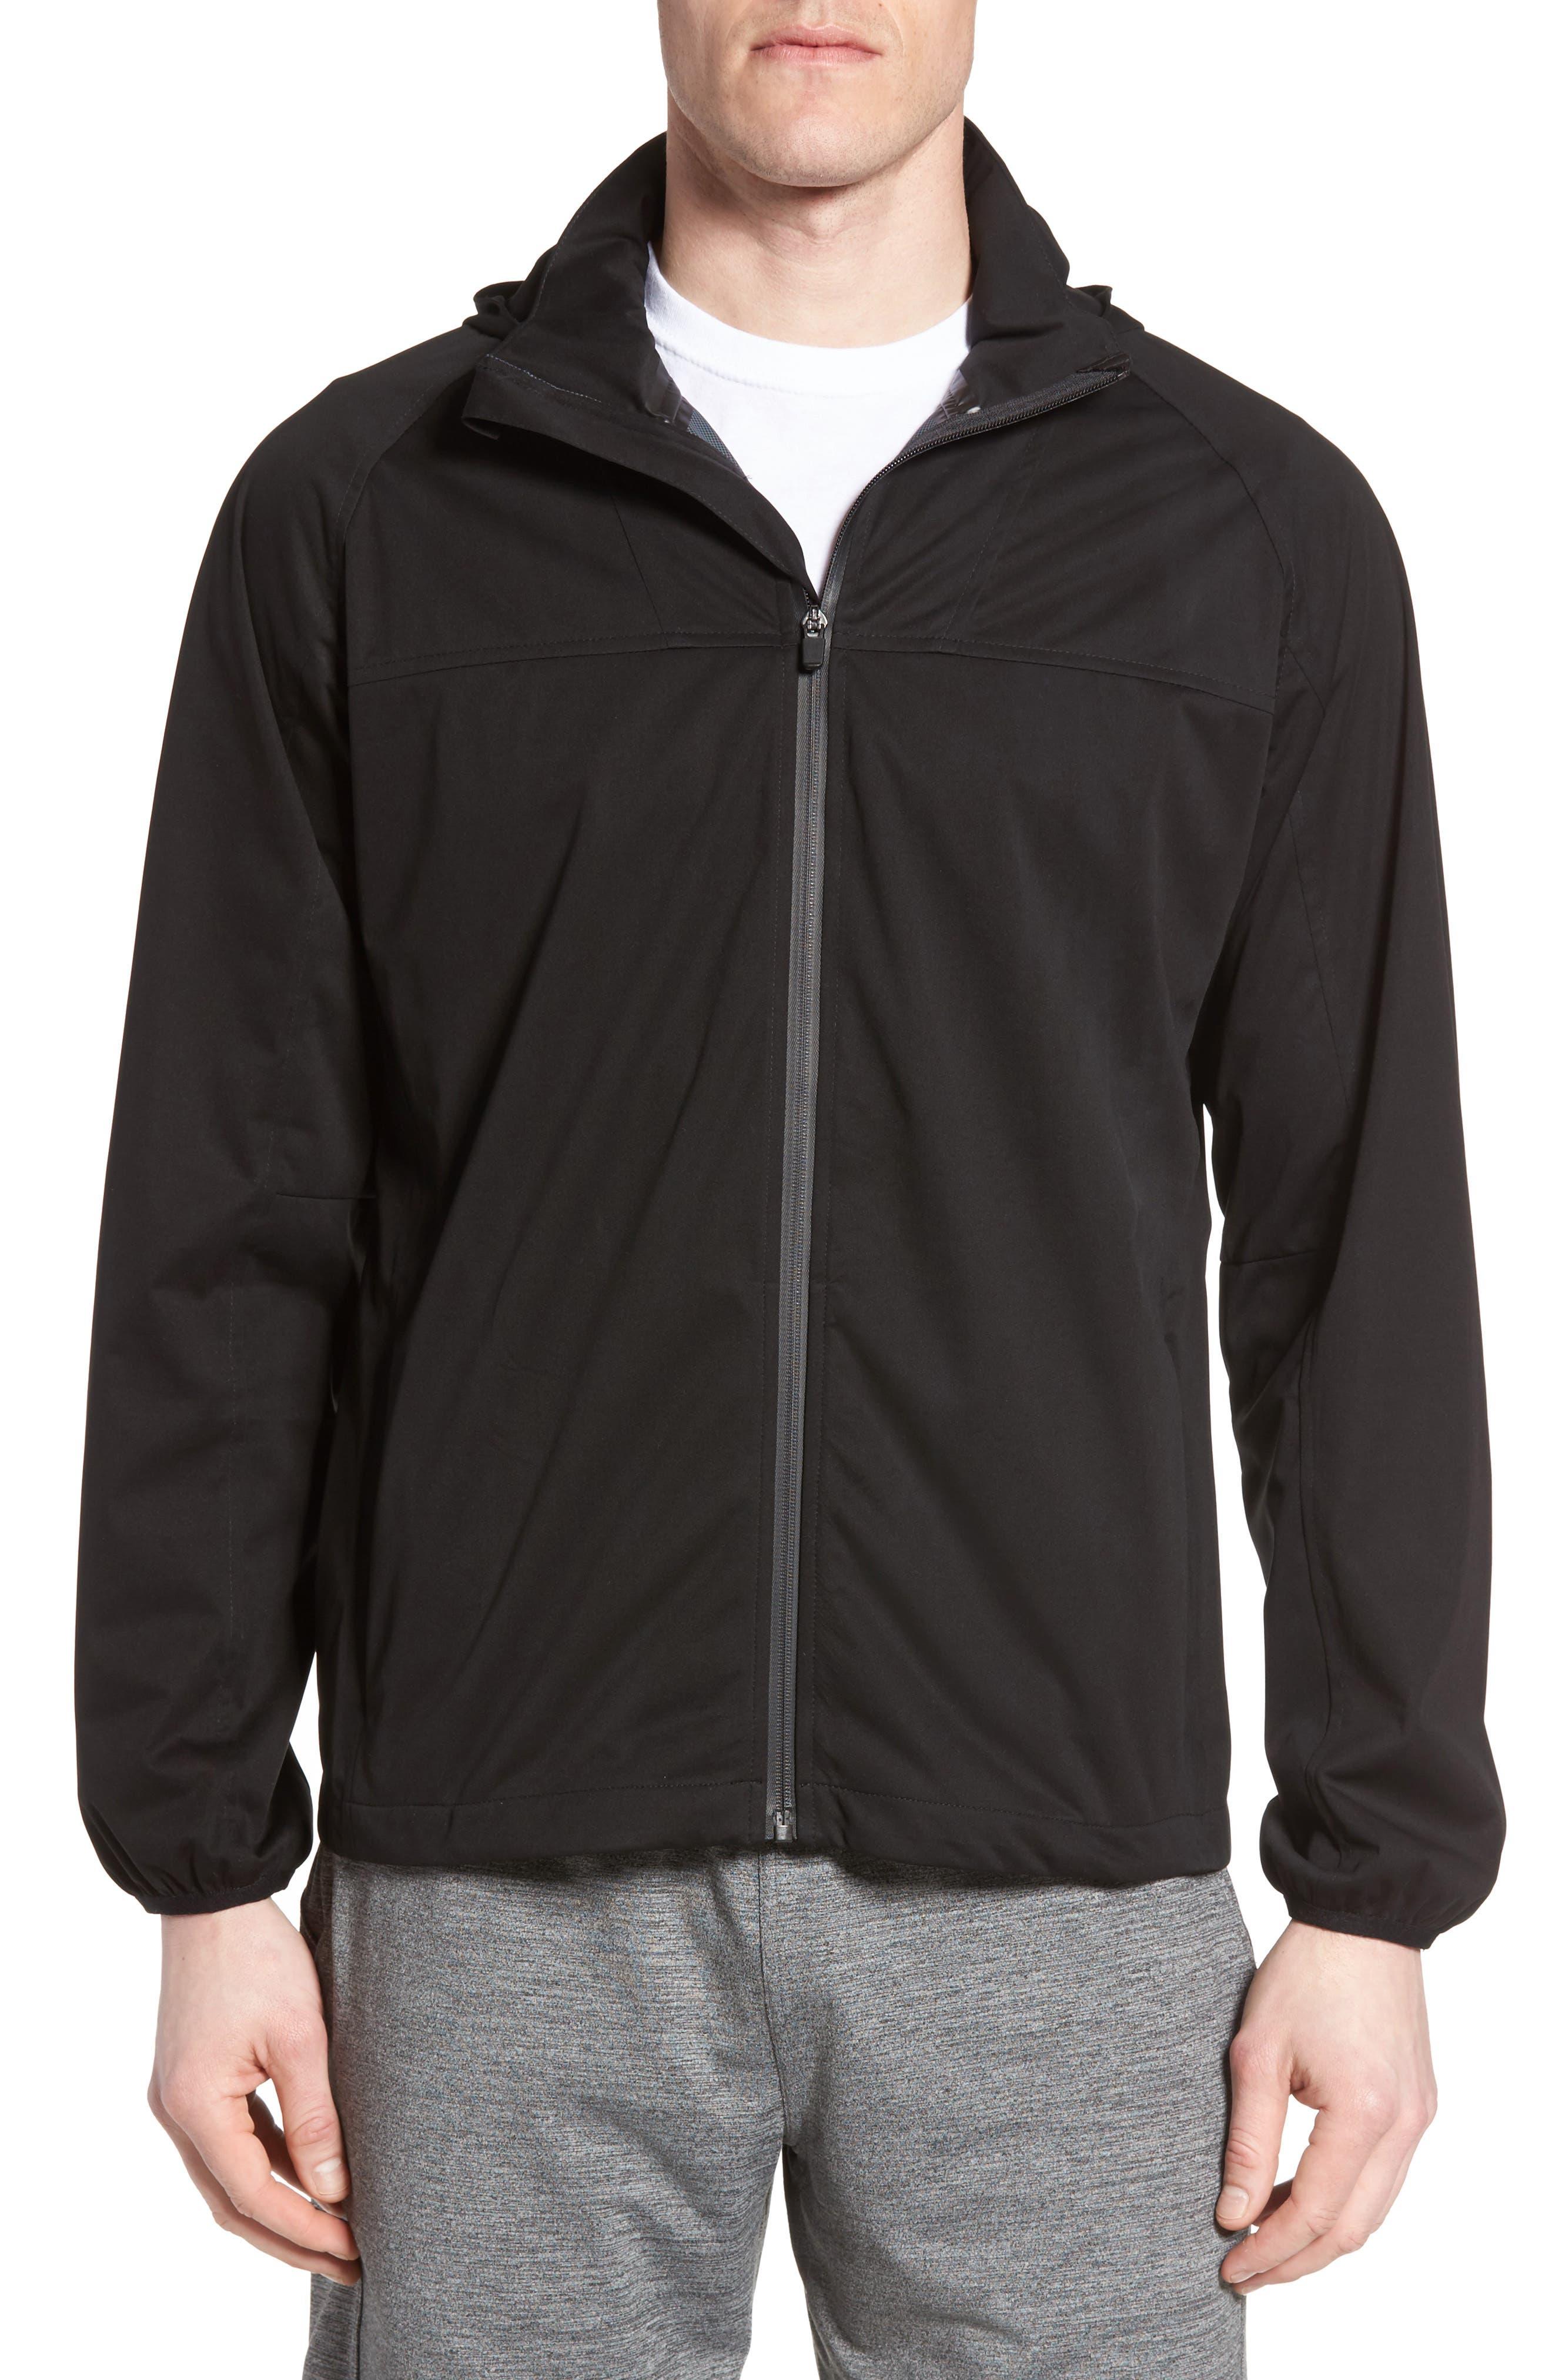 Zella Minimum Waterproof Jacket